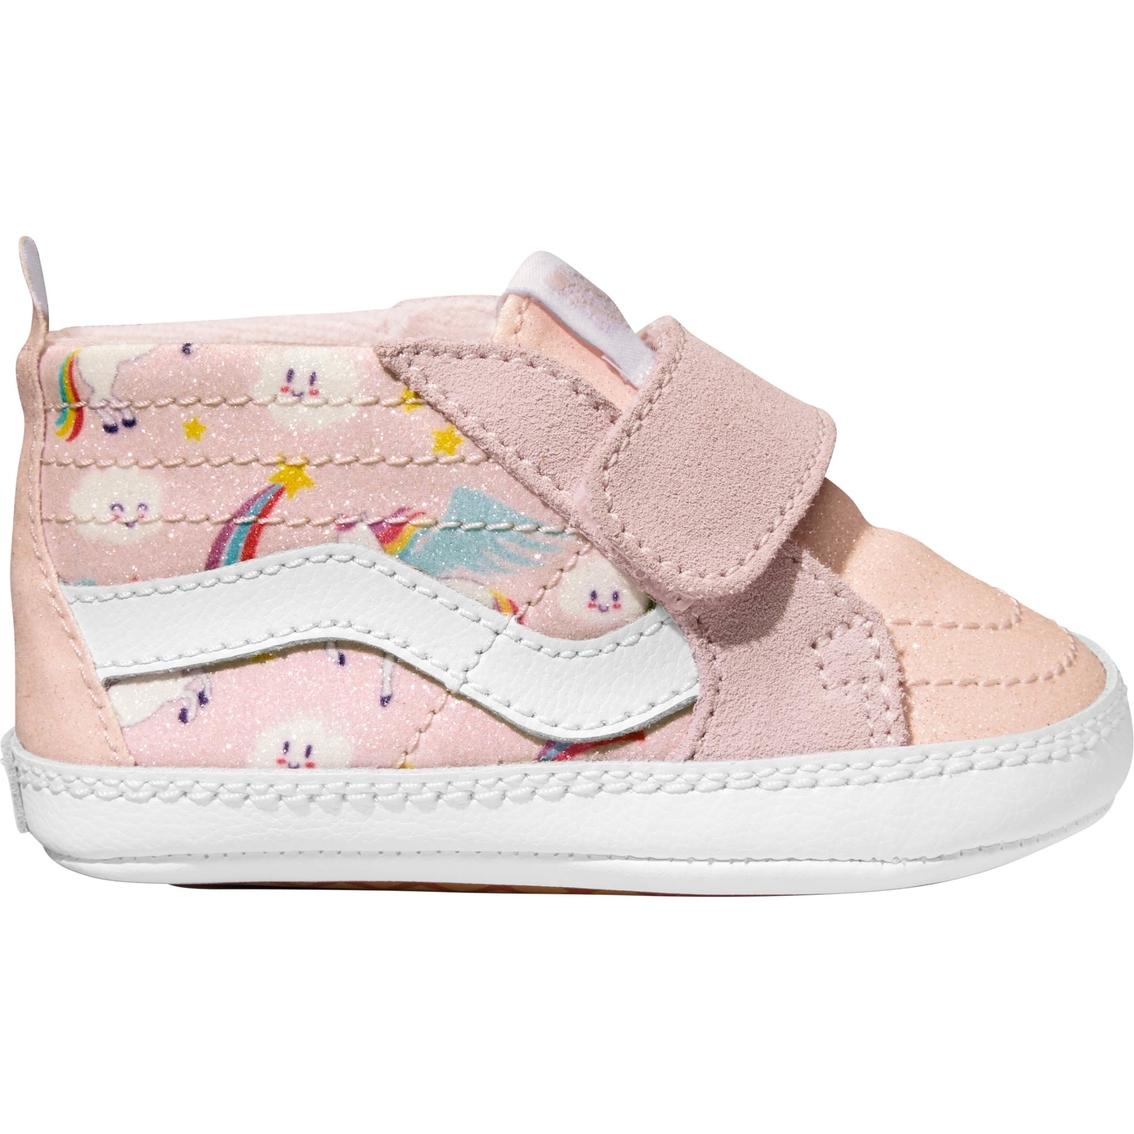 crib vans shoes